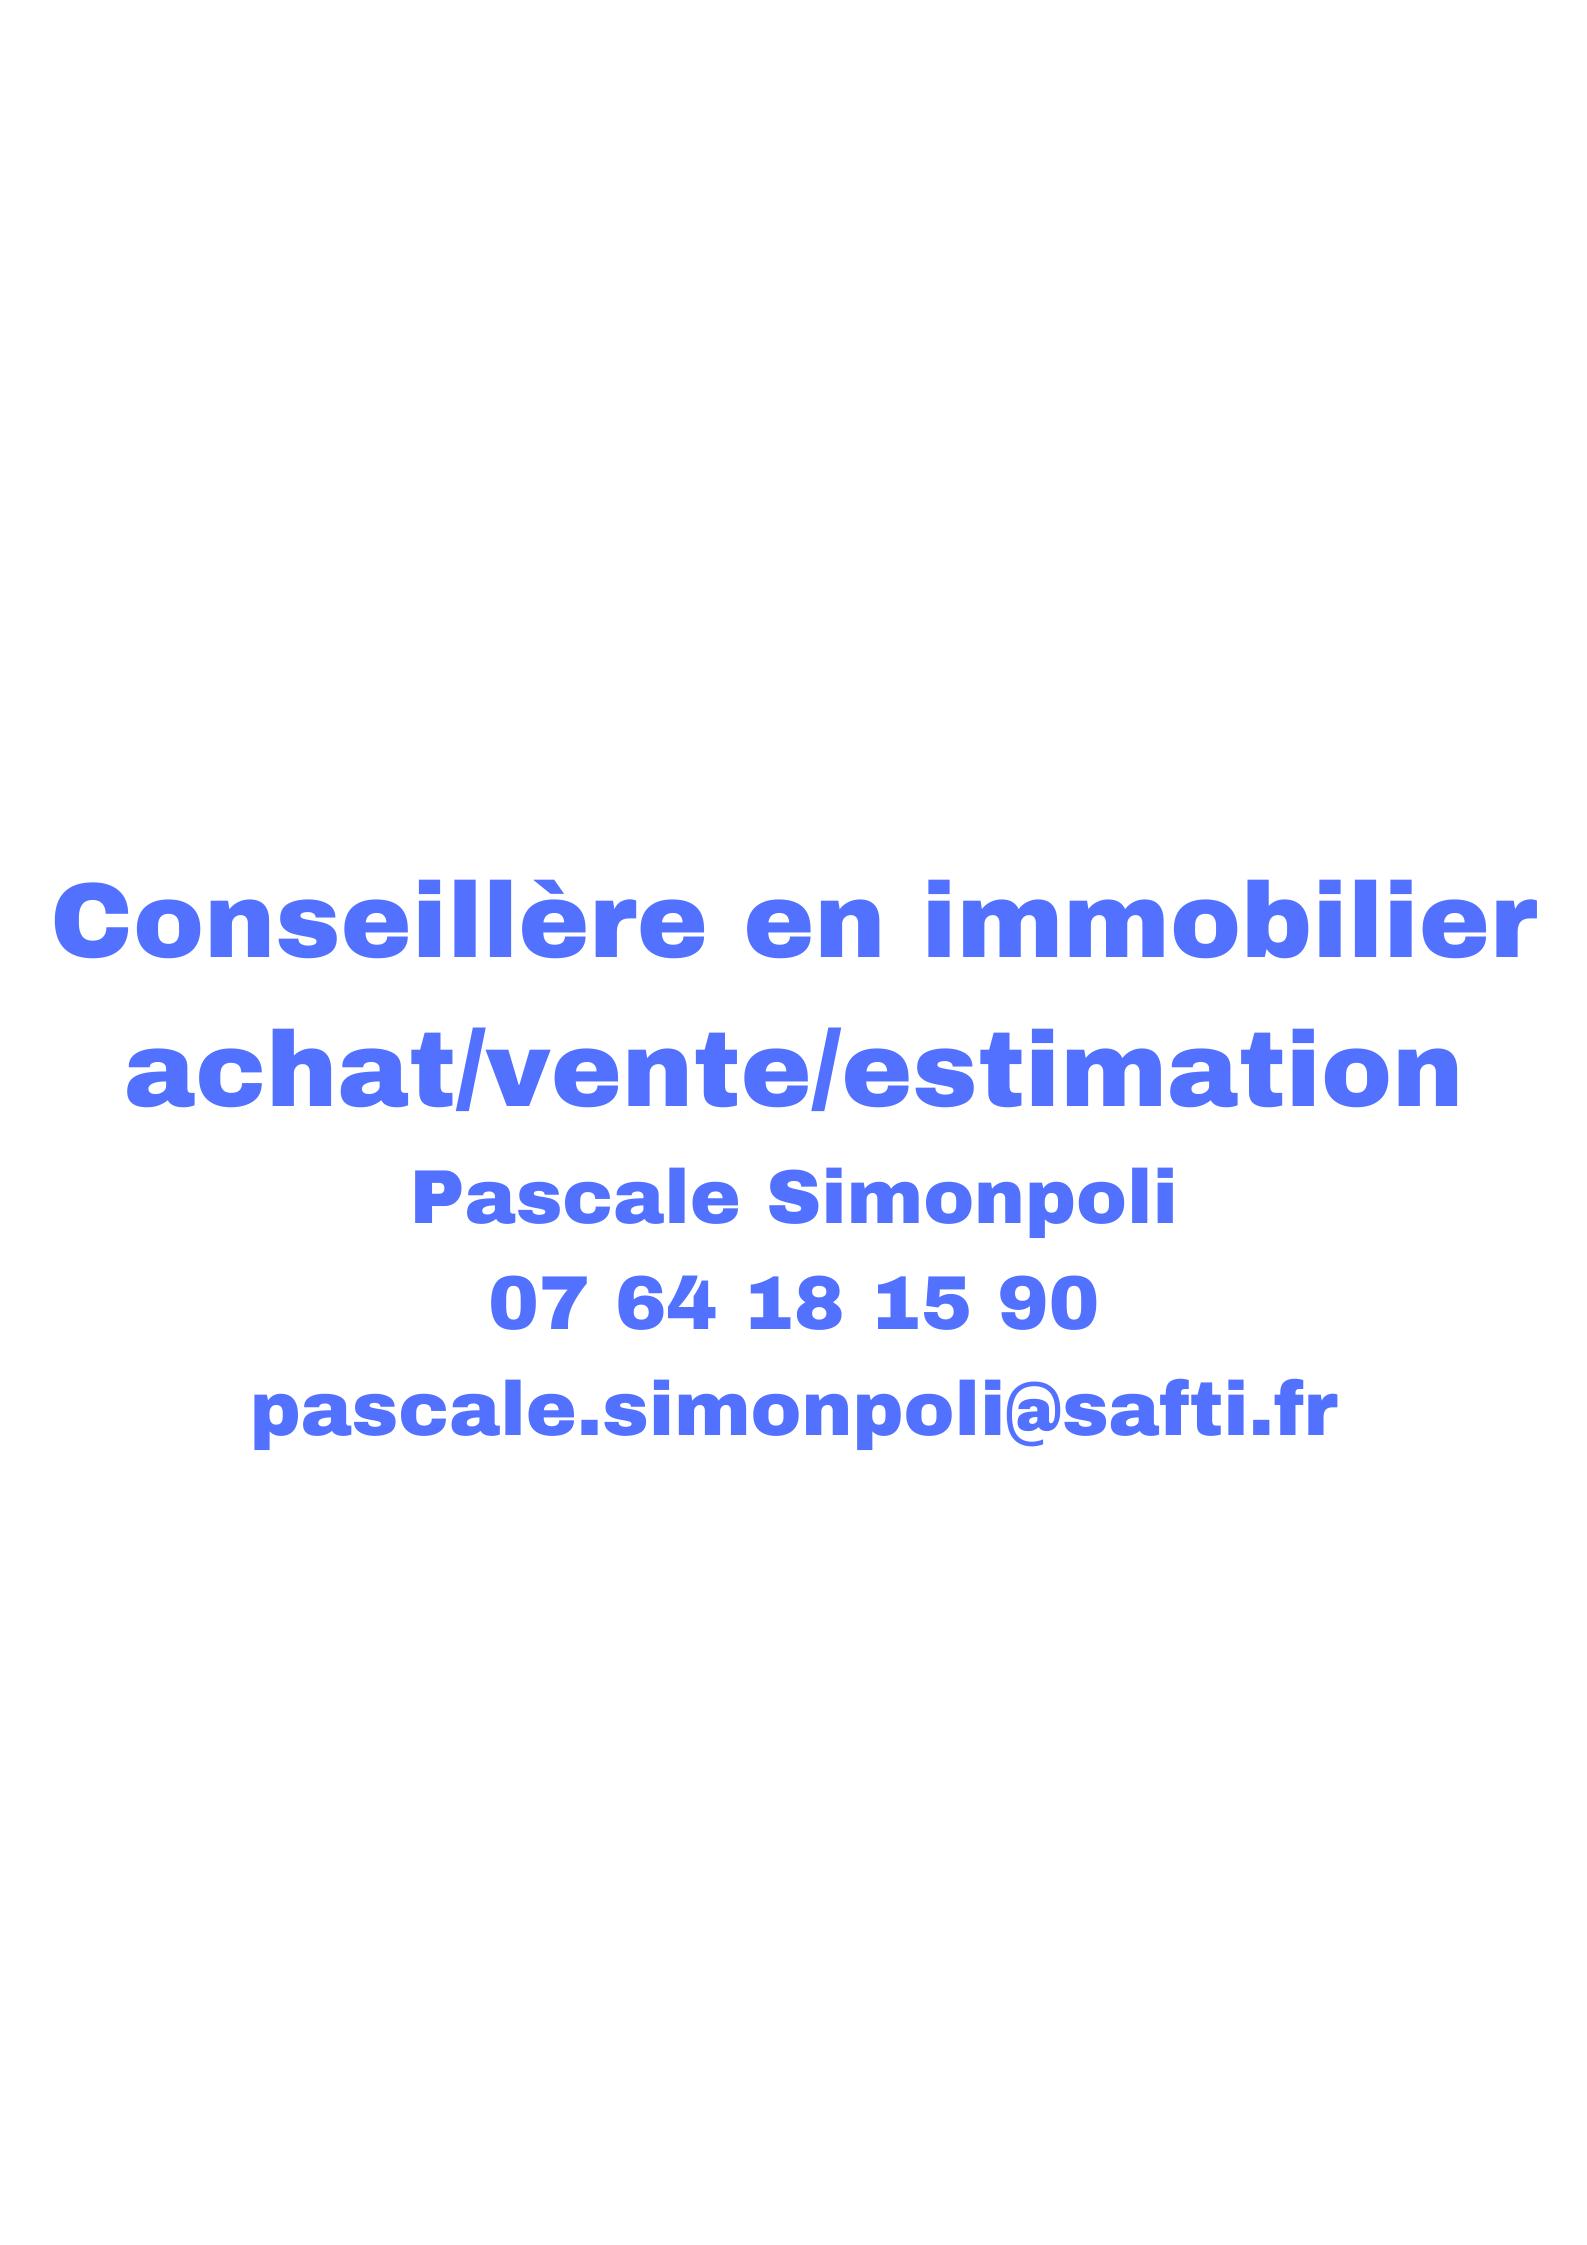 Pascale simonpoli